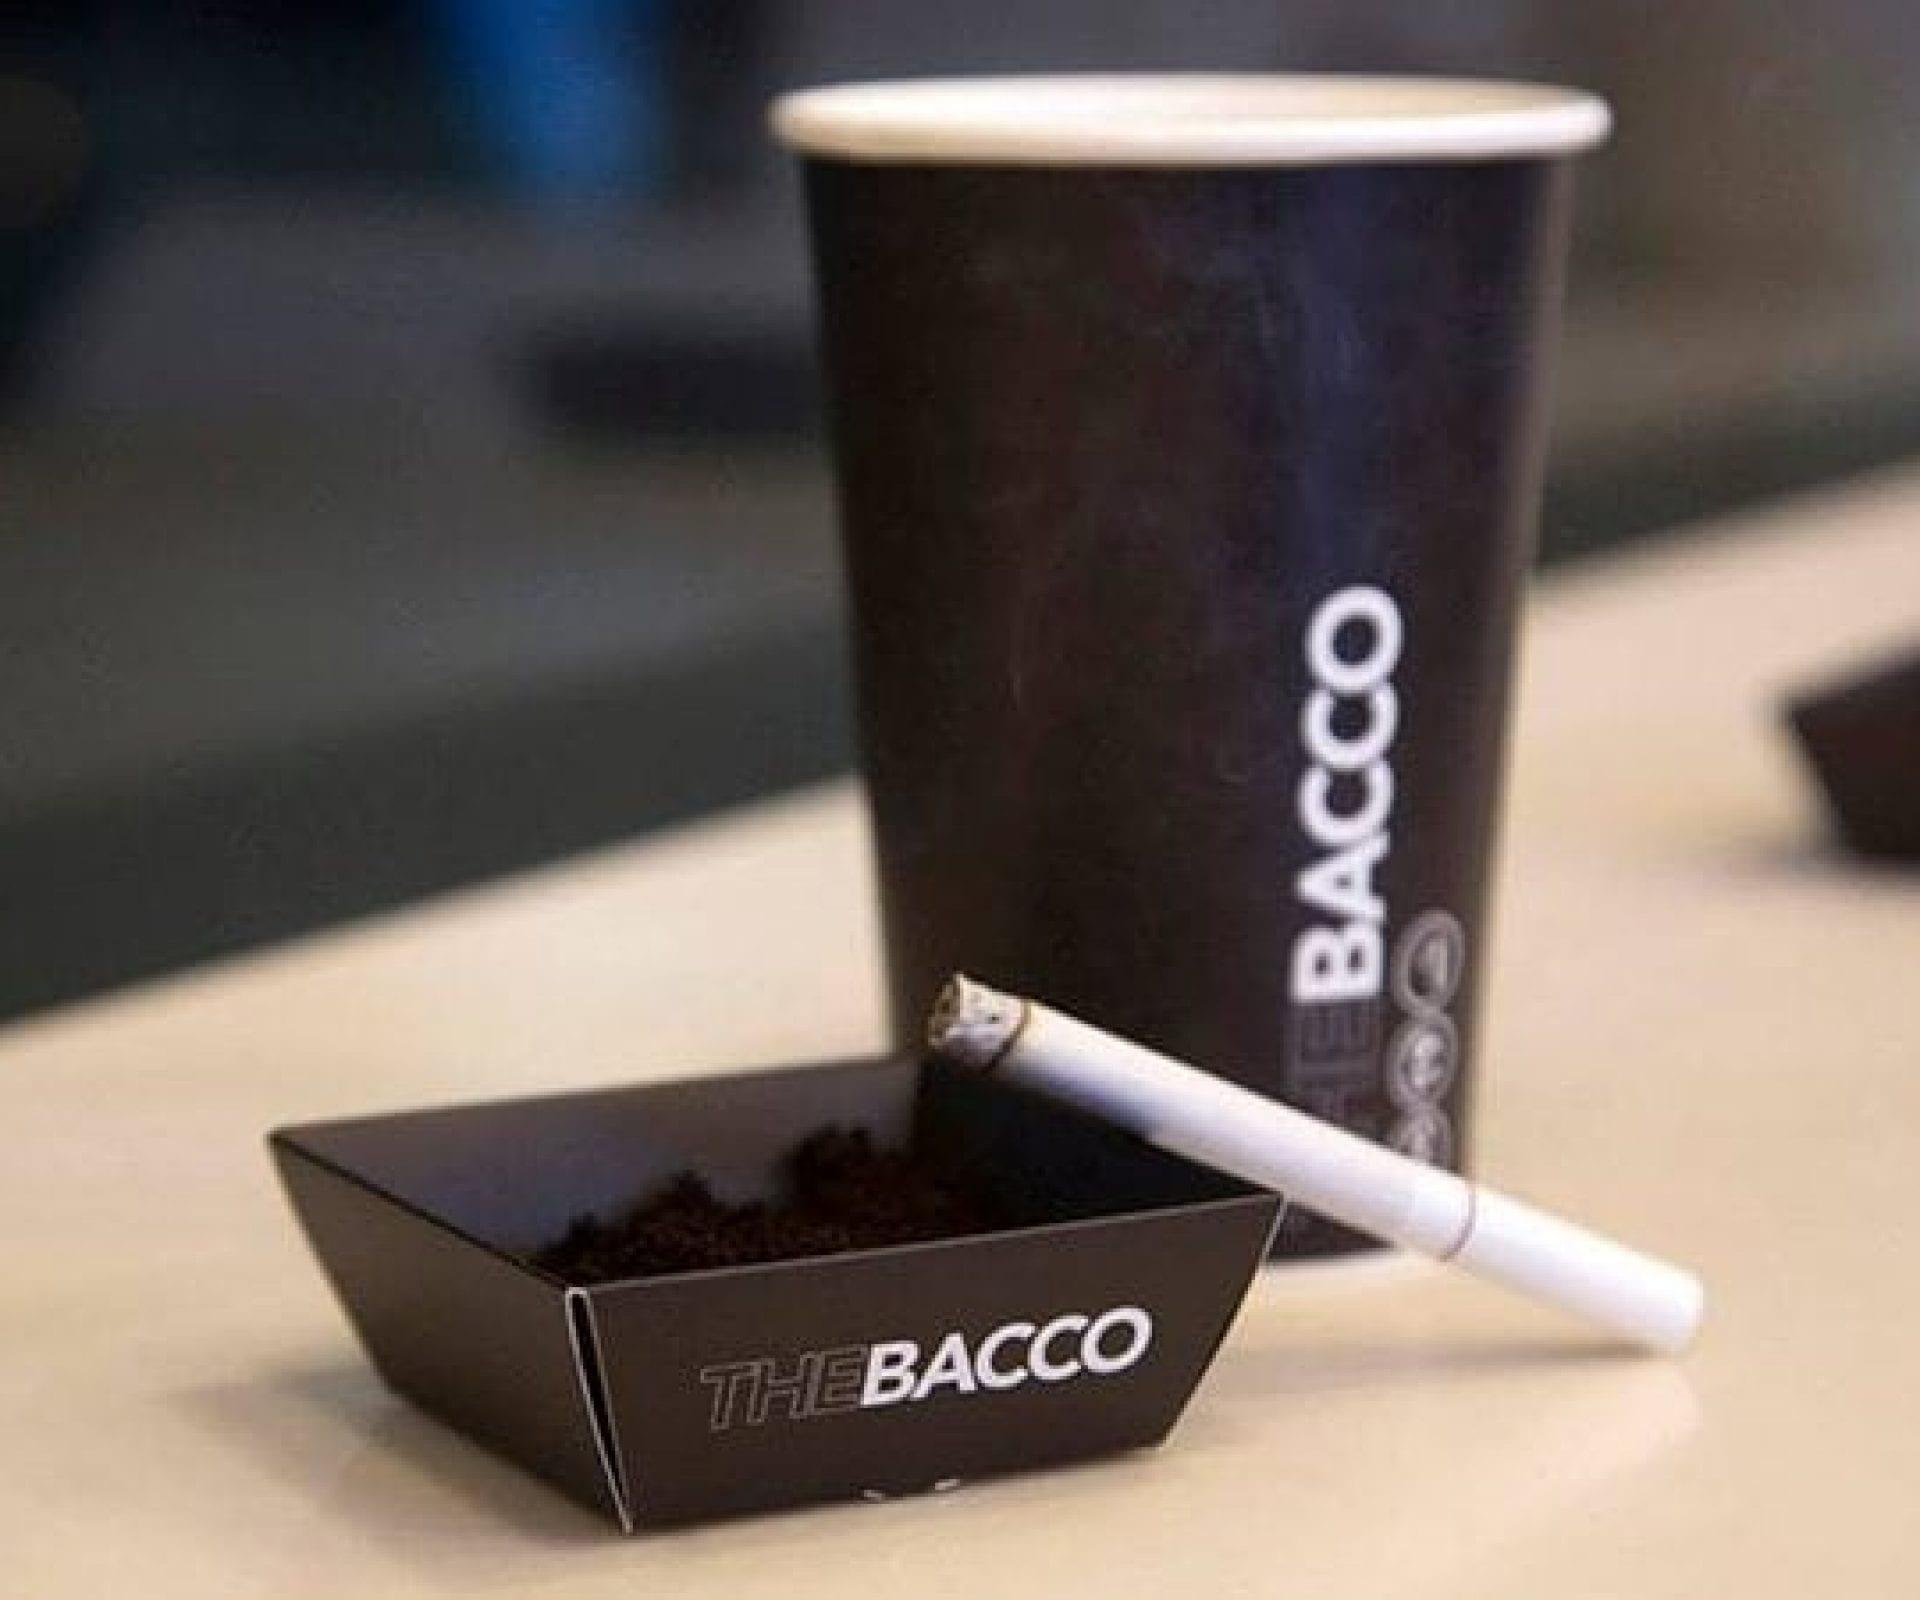 Thebacco | Yongsan-gu, Seoul